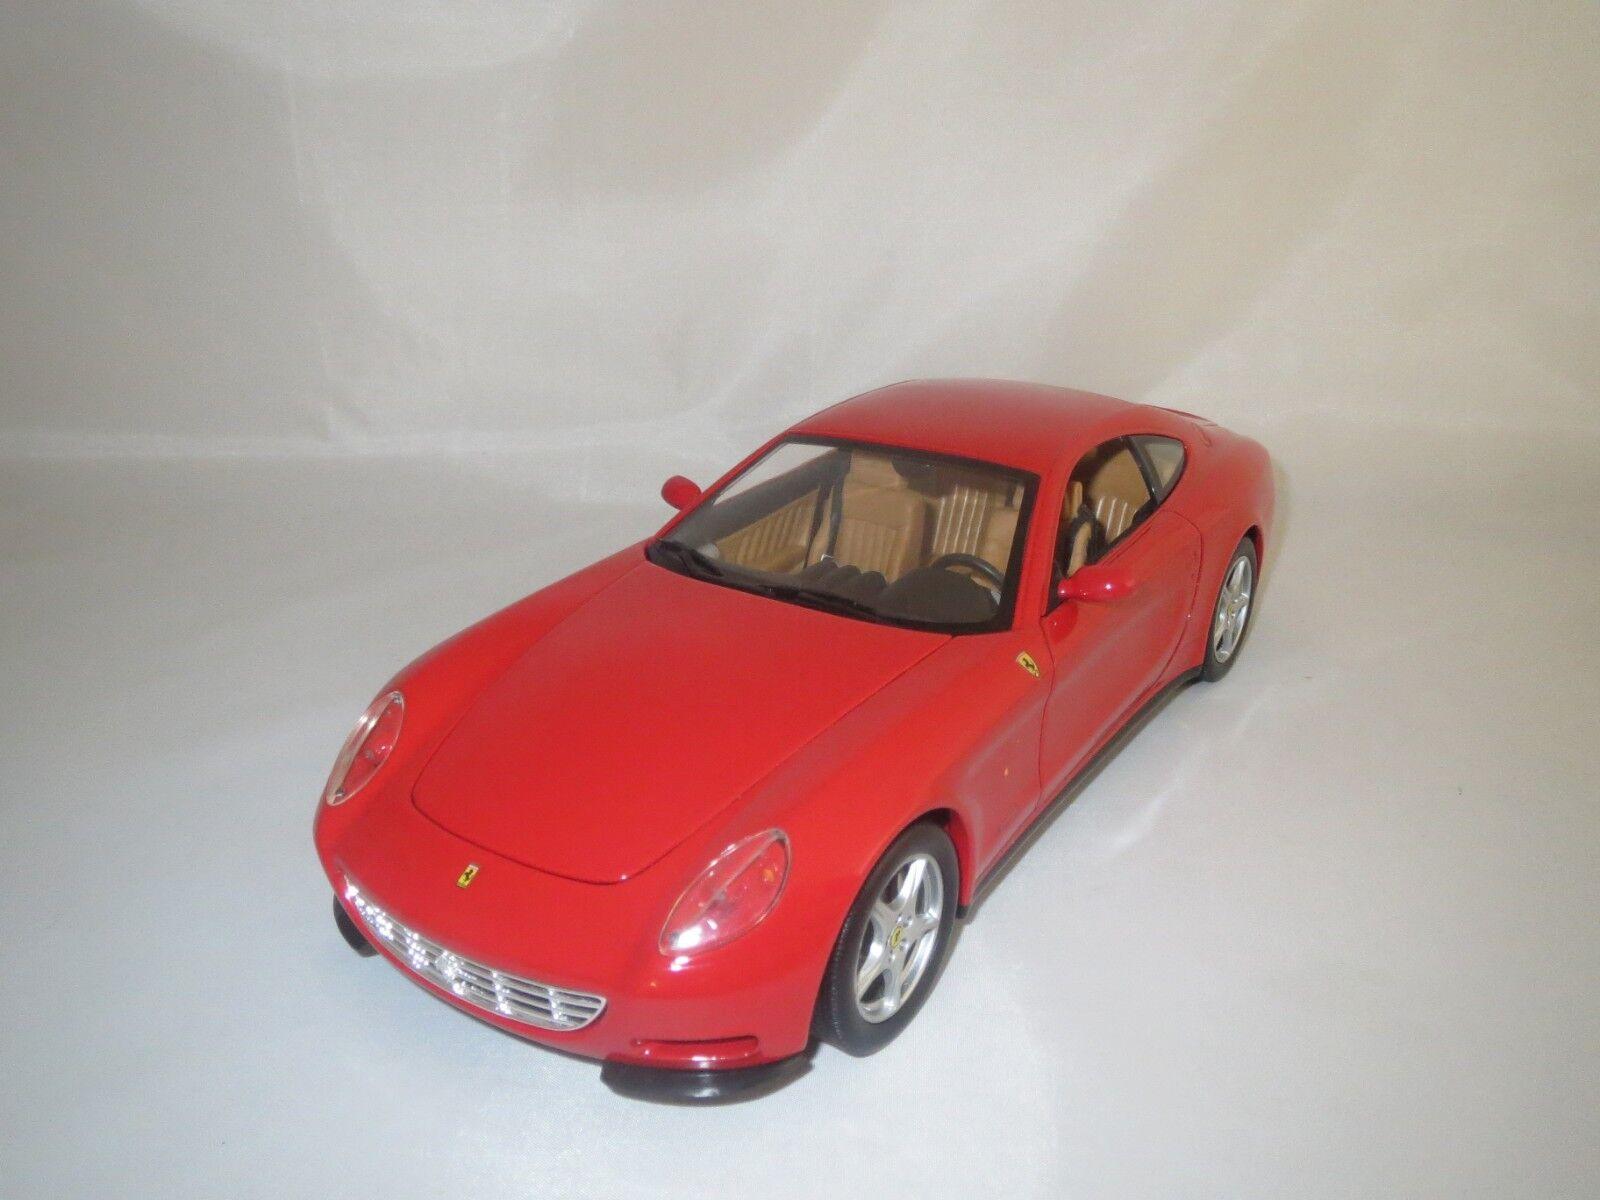 HOT WHEELS Mattel FERRARI f137 (rojo) 1 18 senza imballaggio